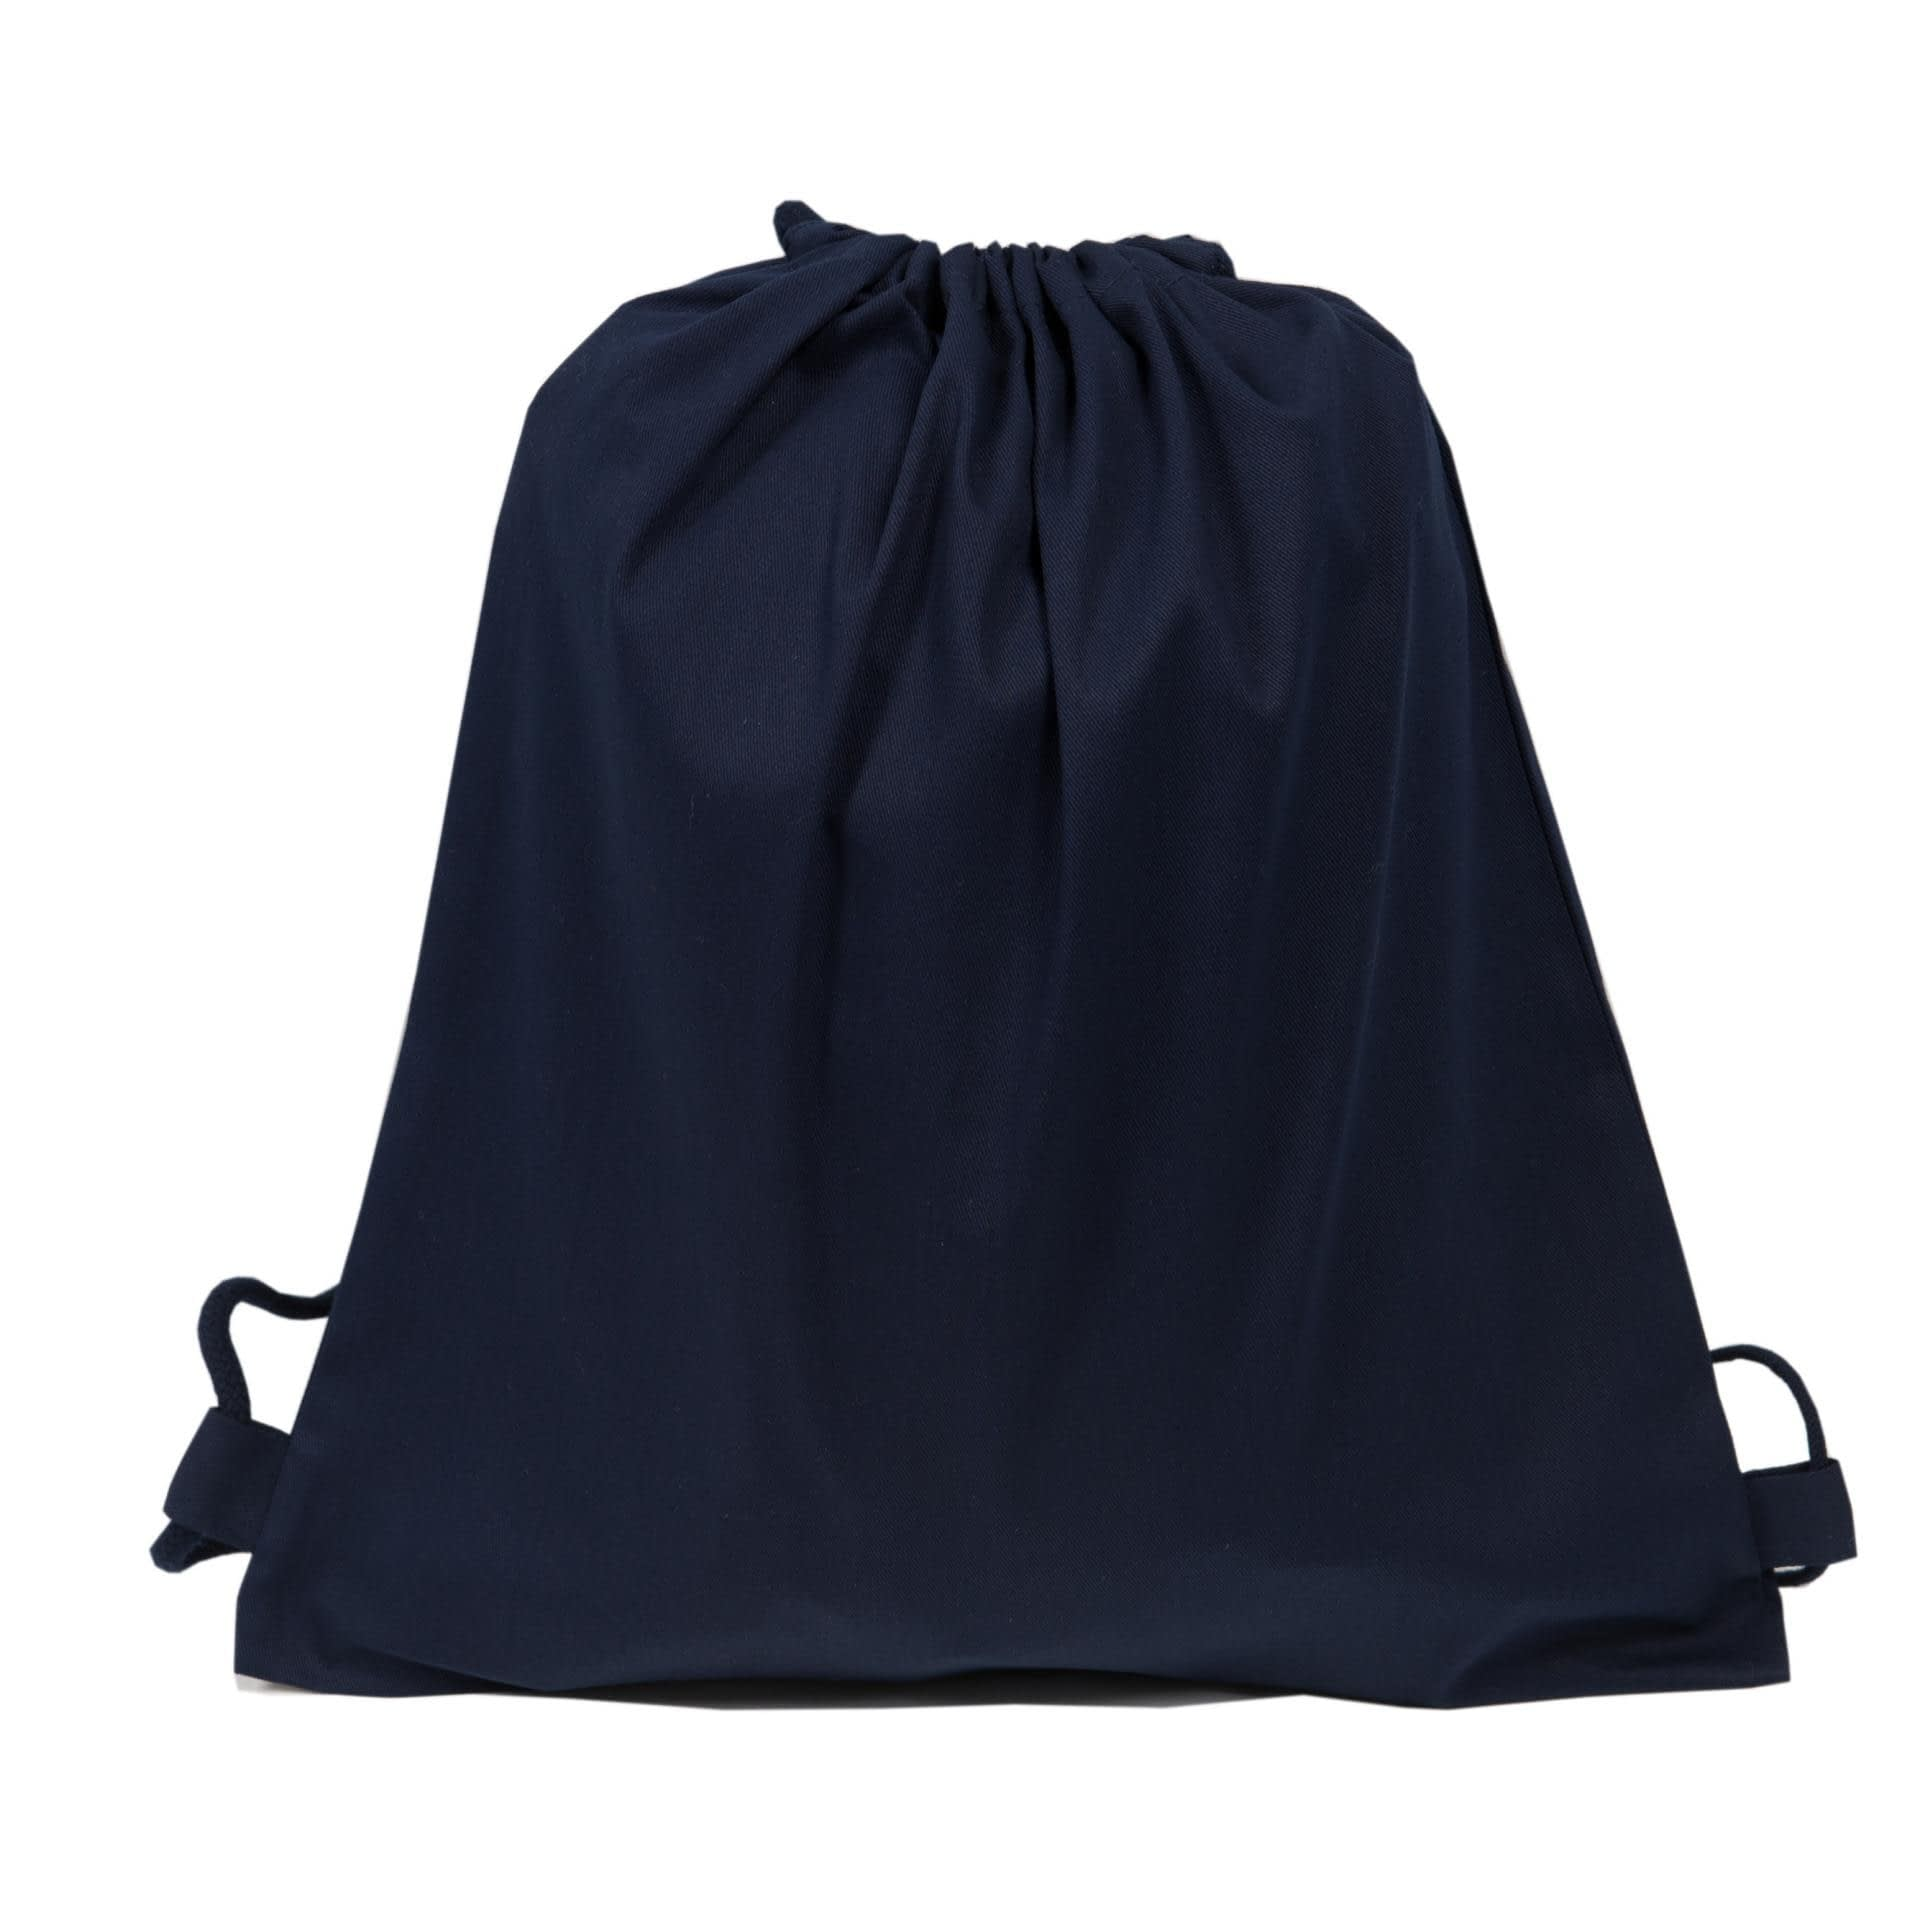 Ткани экосумка - Эко рюкзак саржа 38х42 см. т. Синий